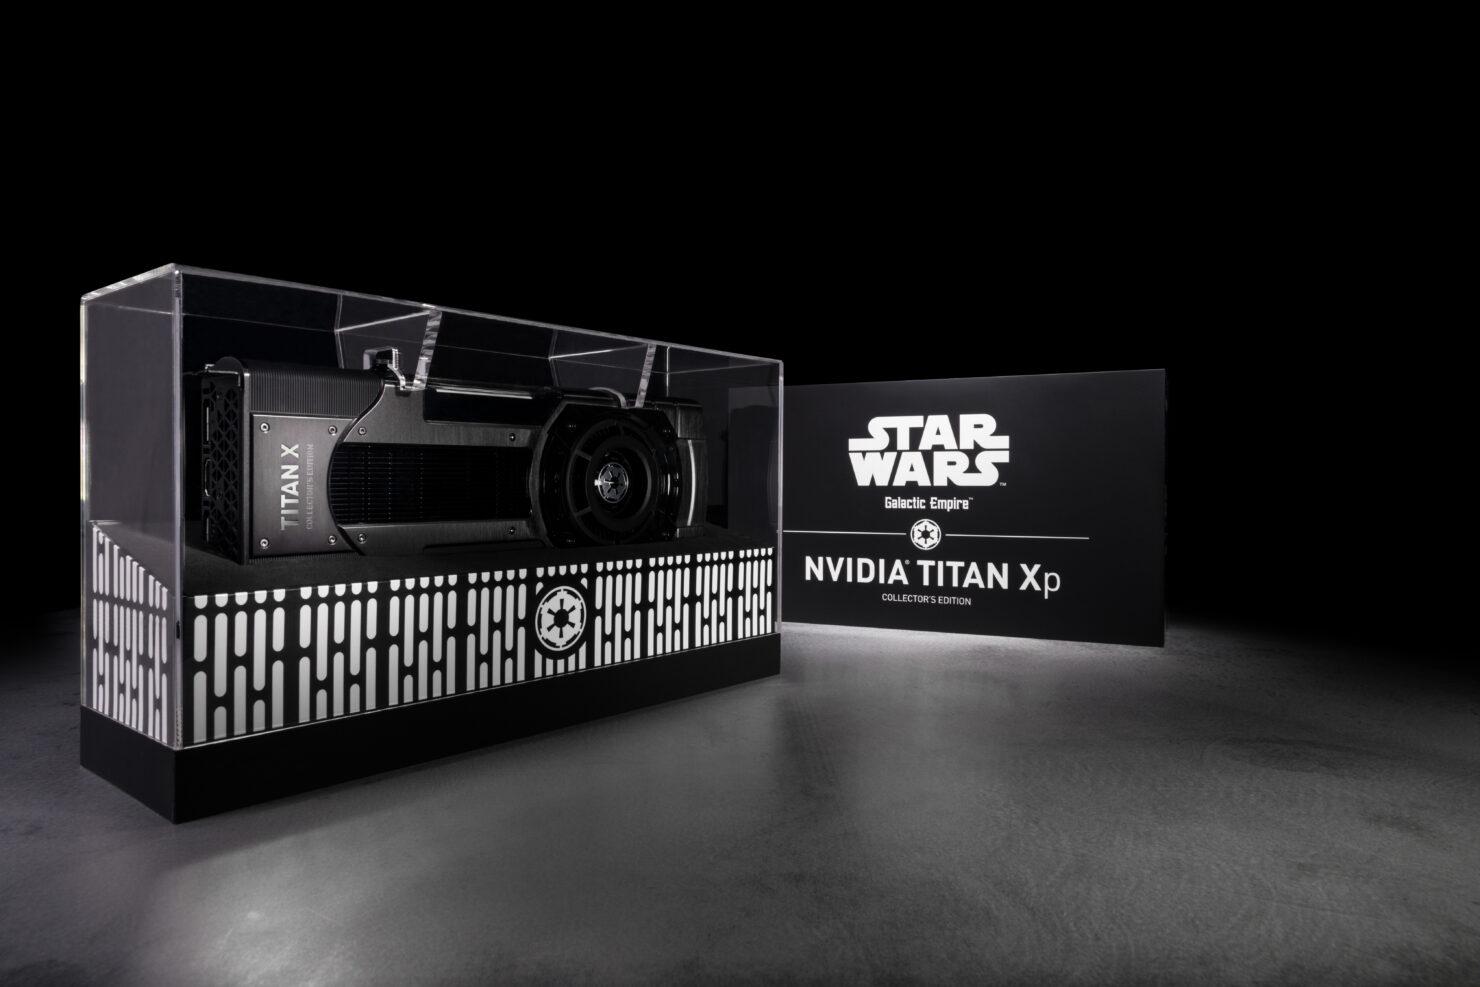 nvidia-geforce-titan-xp-star-wars-collectors-edition-galactic-empire-packaging-photo-001